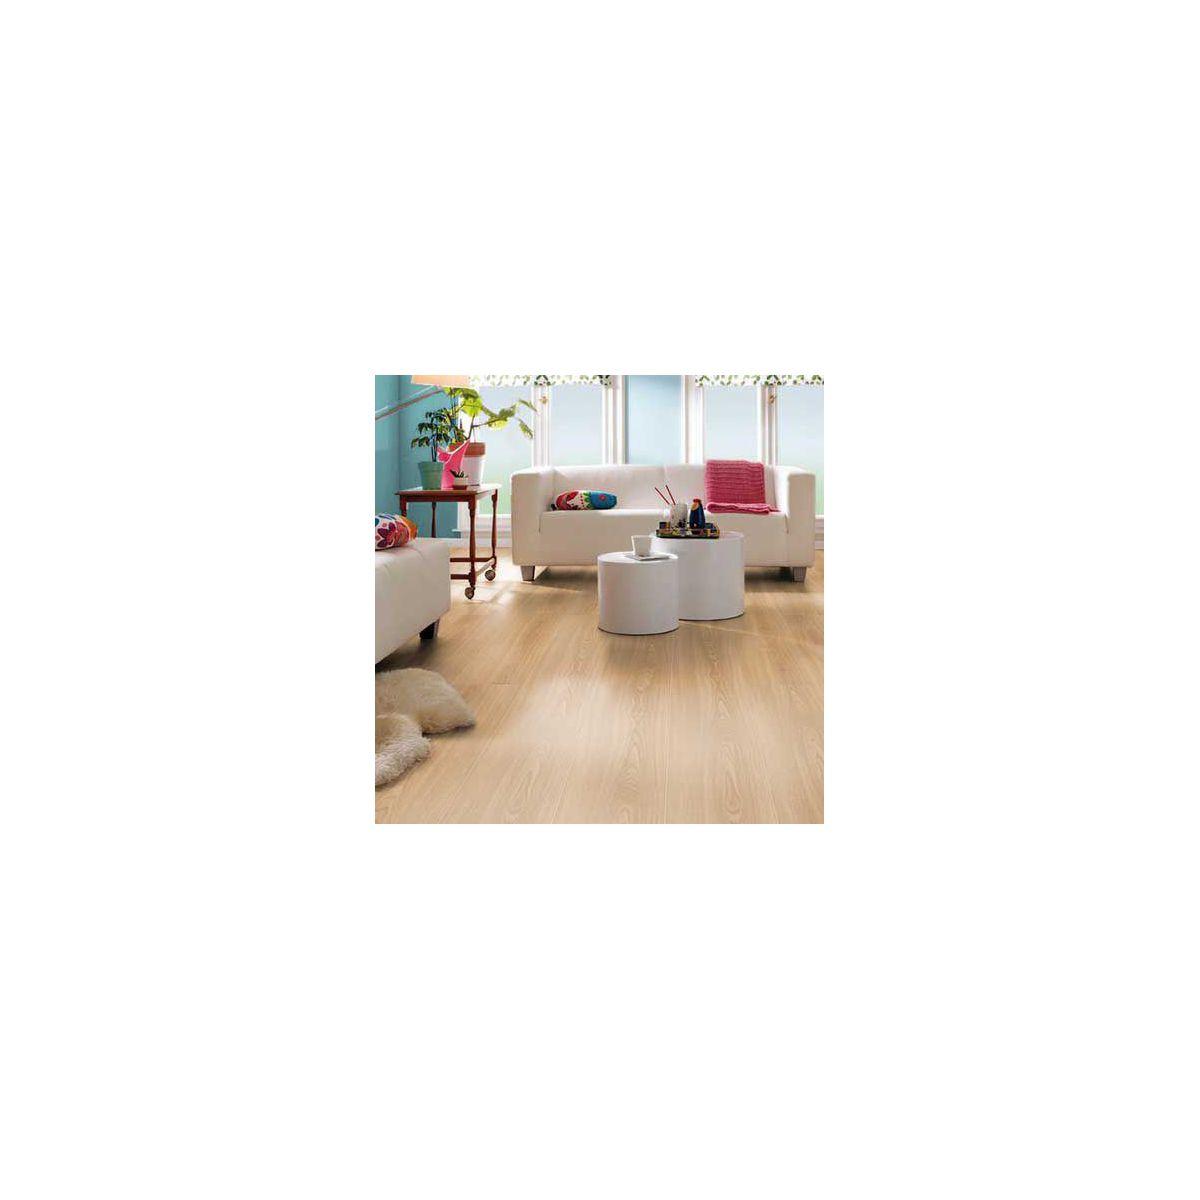 disano planche large ch ne imitation bois. Black Bedroom Furniture Sets. Home Design Ideas